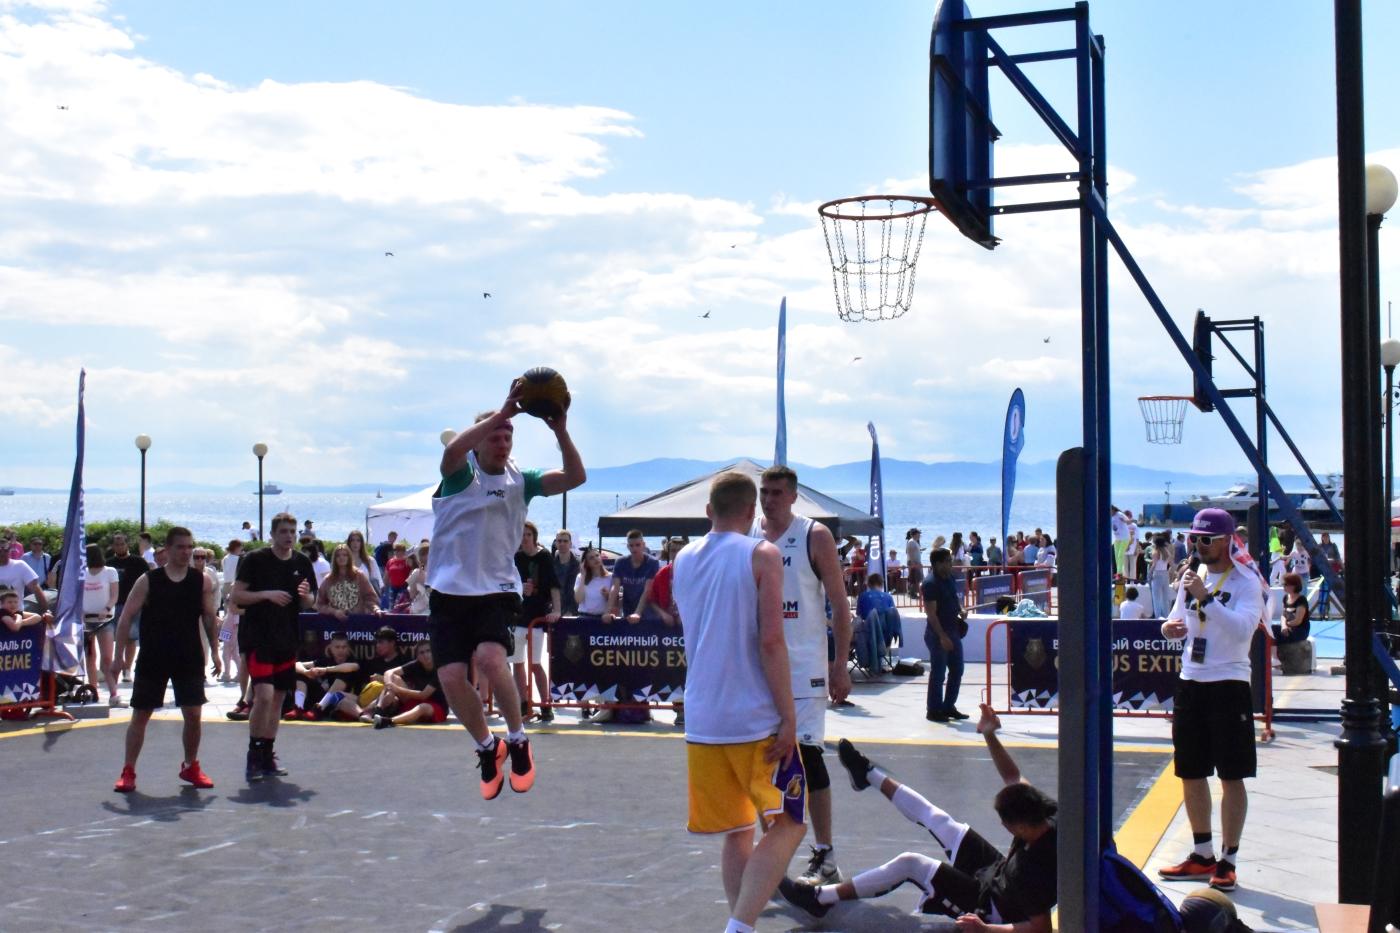 Баскетбол. Стритбол. Уличный баскетбол. Баскетбол Владивостока. Баскетбол Приморья. Новости спорта Приморья. Спорт во Владивостоке. Спорт Владивостока. Новости баскетбола. Результаты баскетбола.